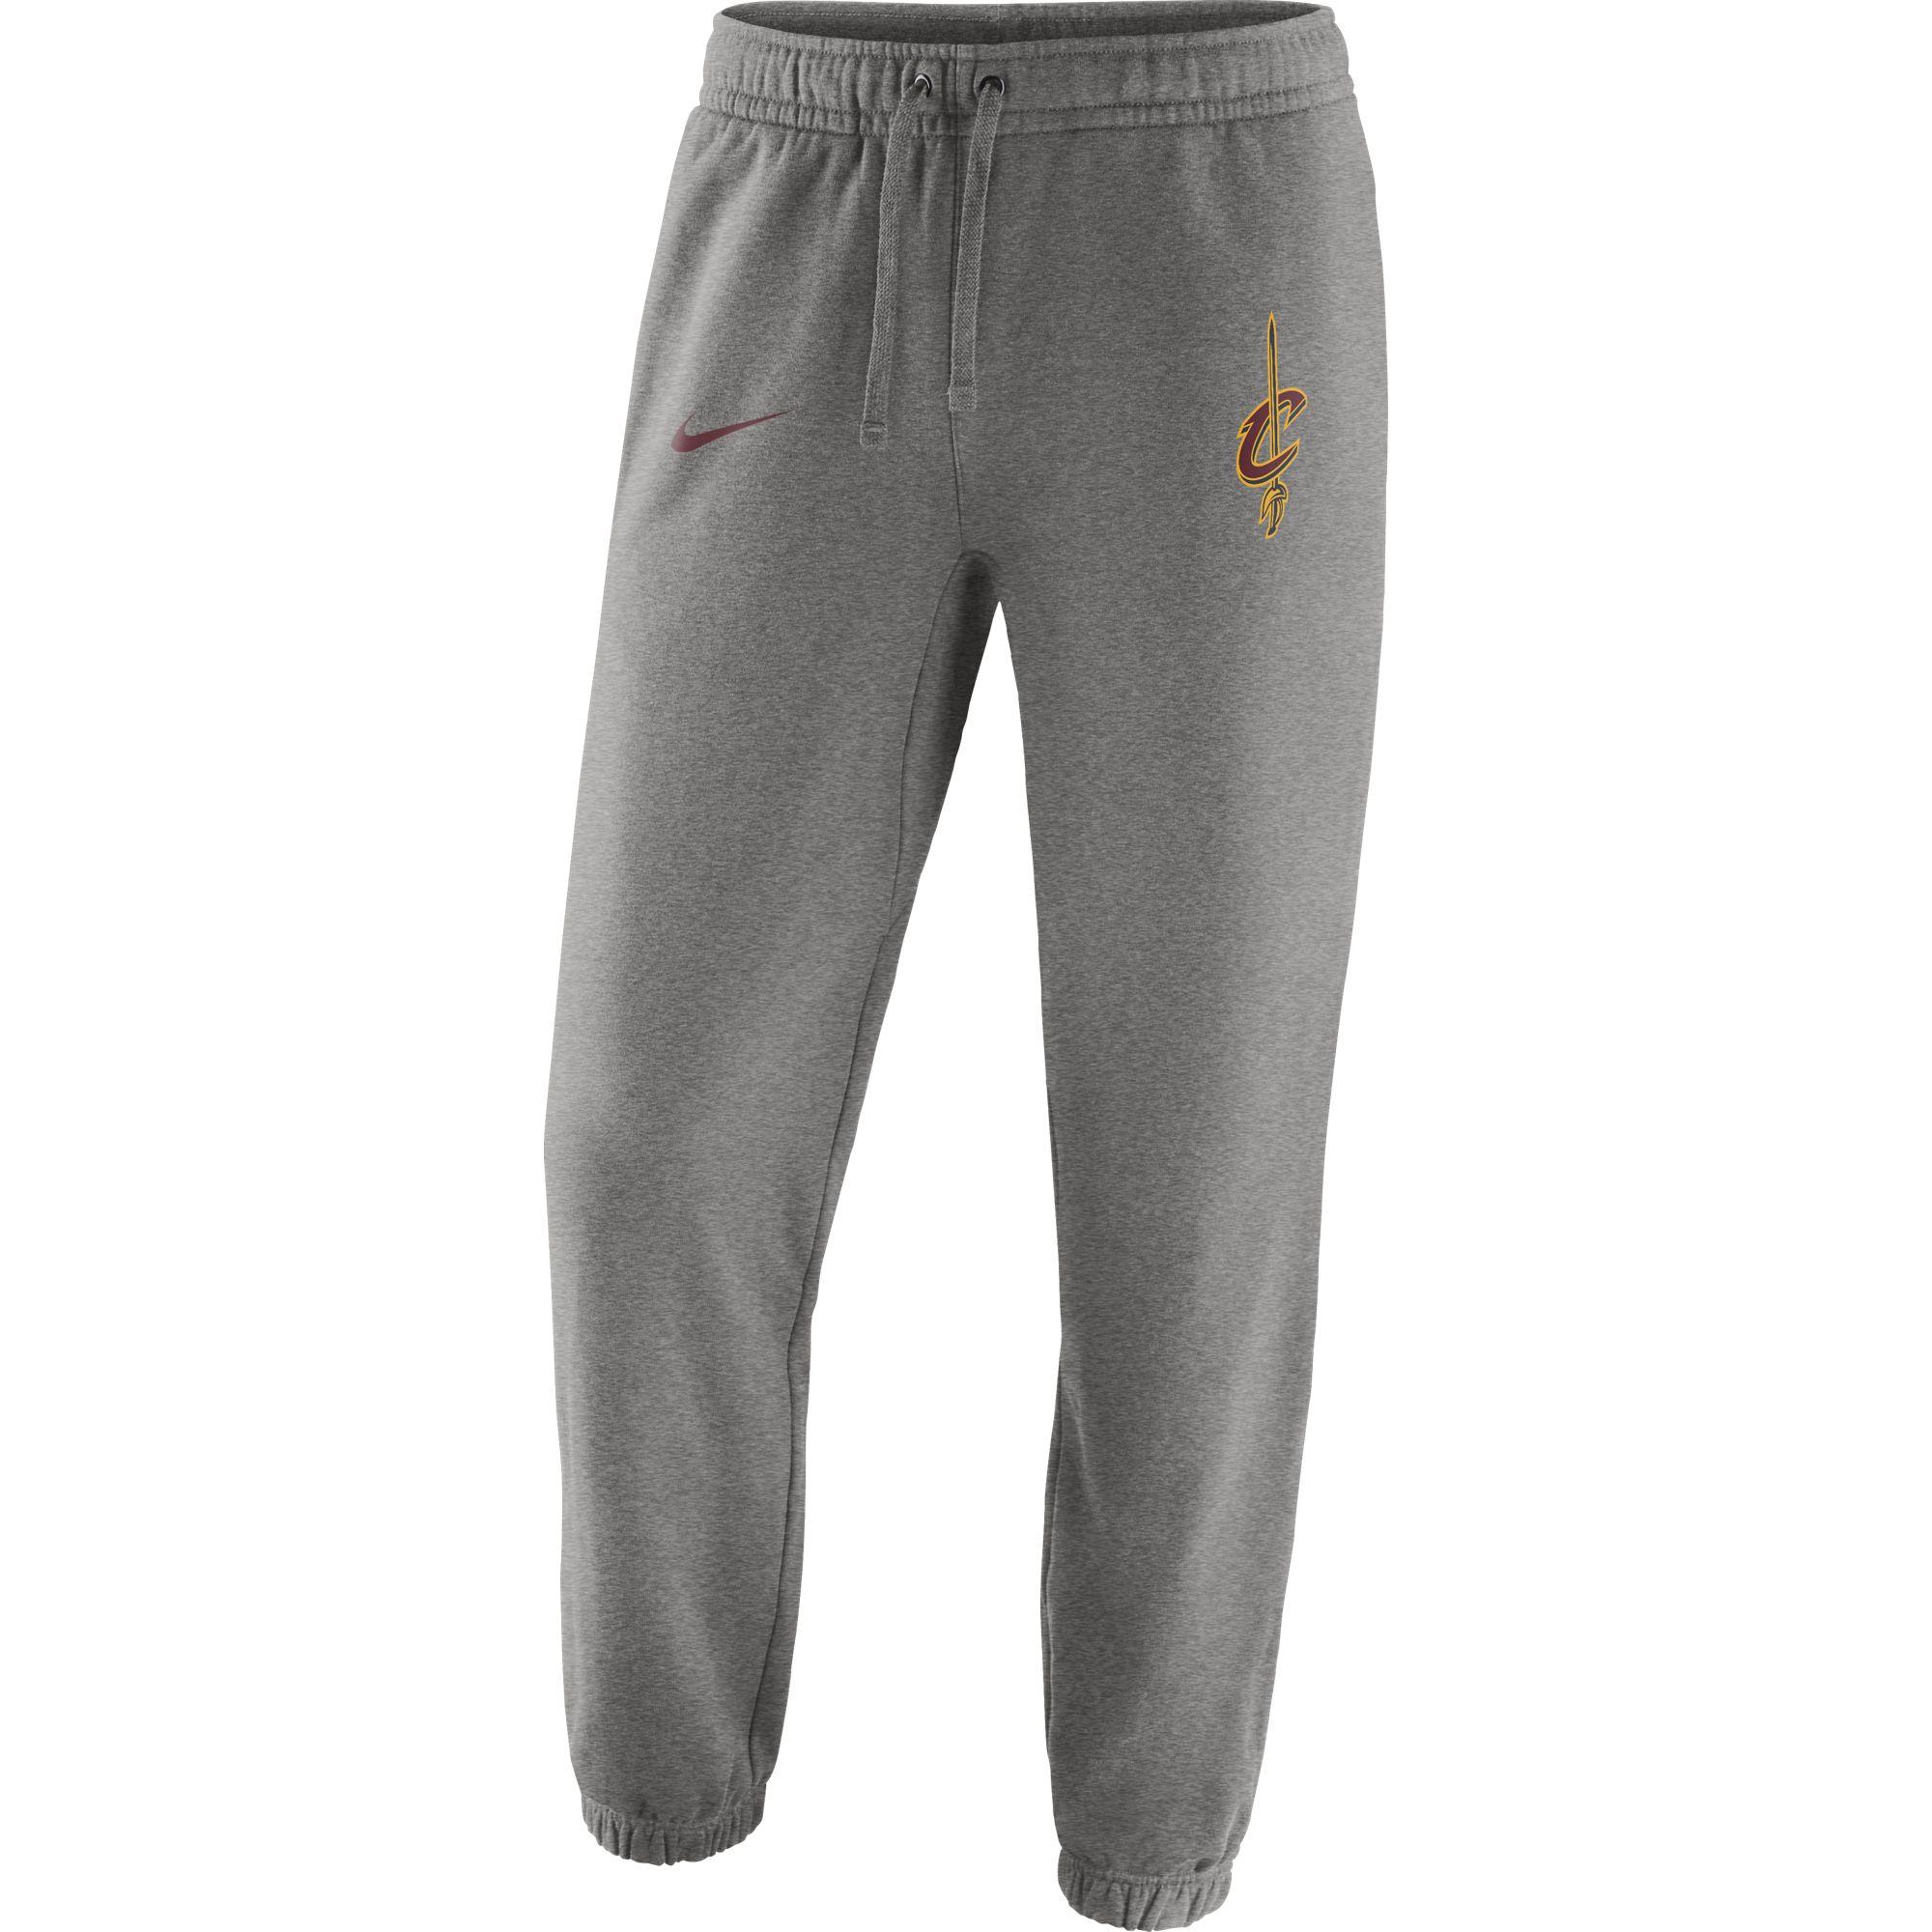 Cleveland Cavaliers Nike Club Fleece Pants - Gray